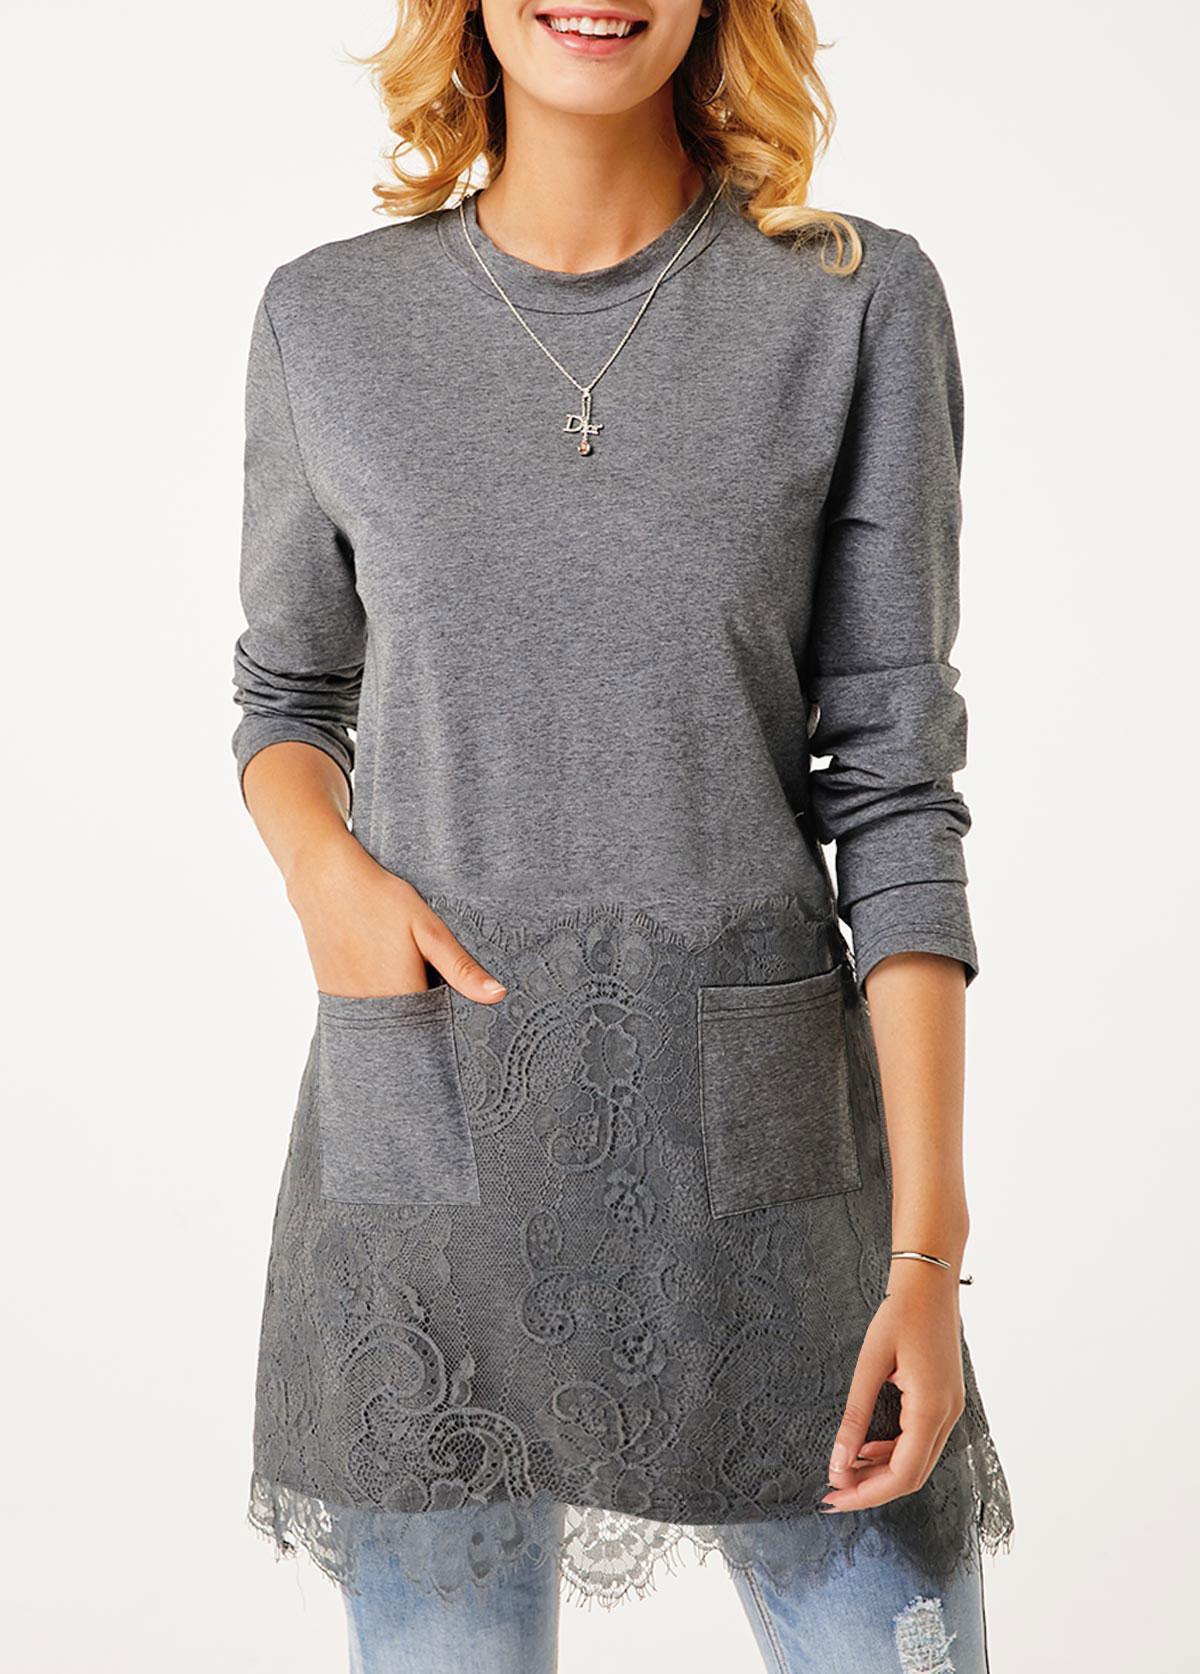 Lace Panel Long Sleeve Pocket T Shirt